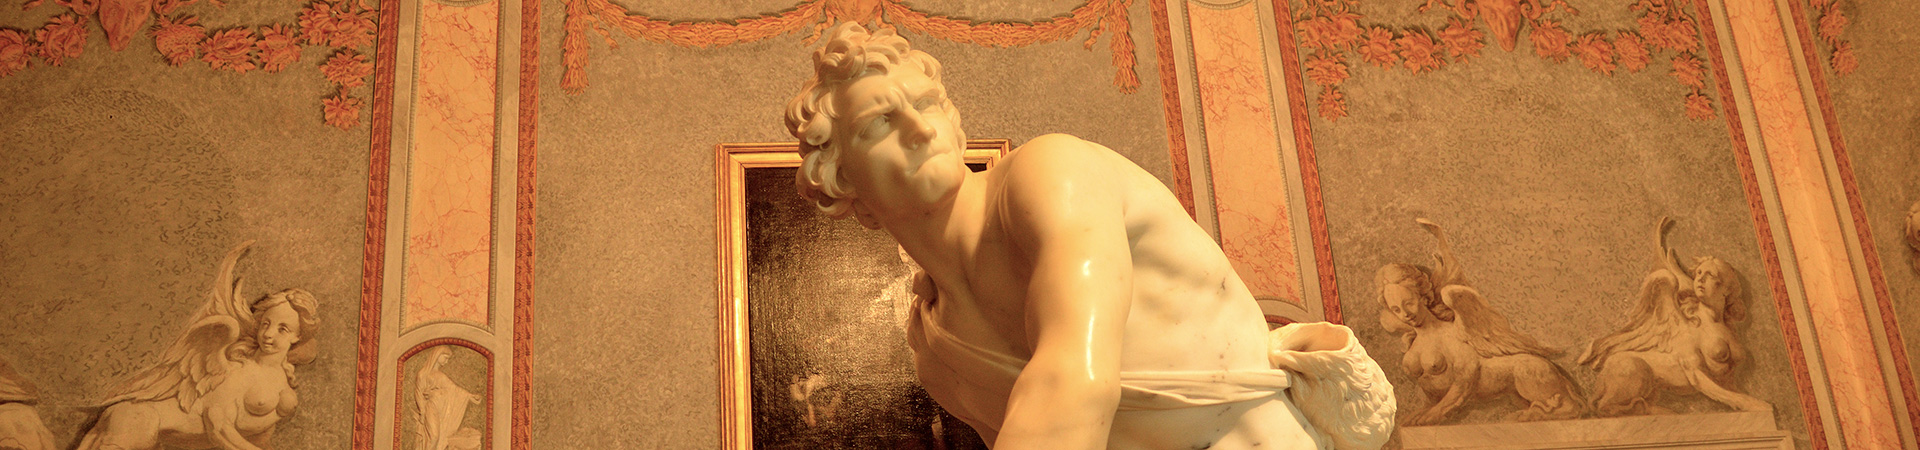 Statue of David by Bernini, Borghese Gallery, Rome